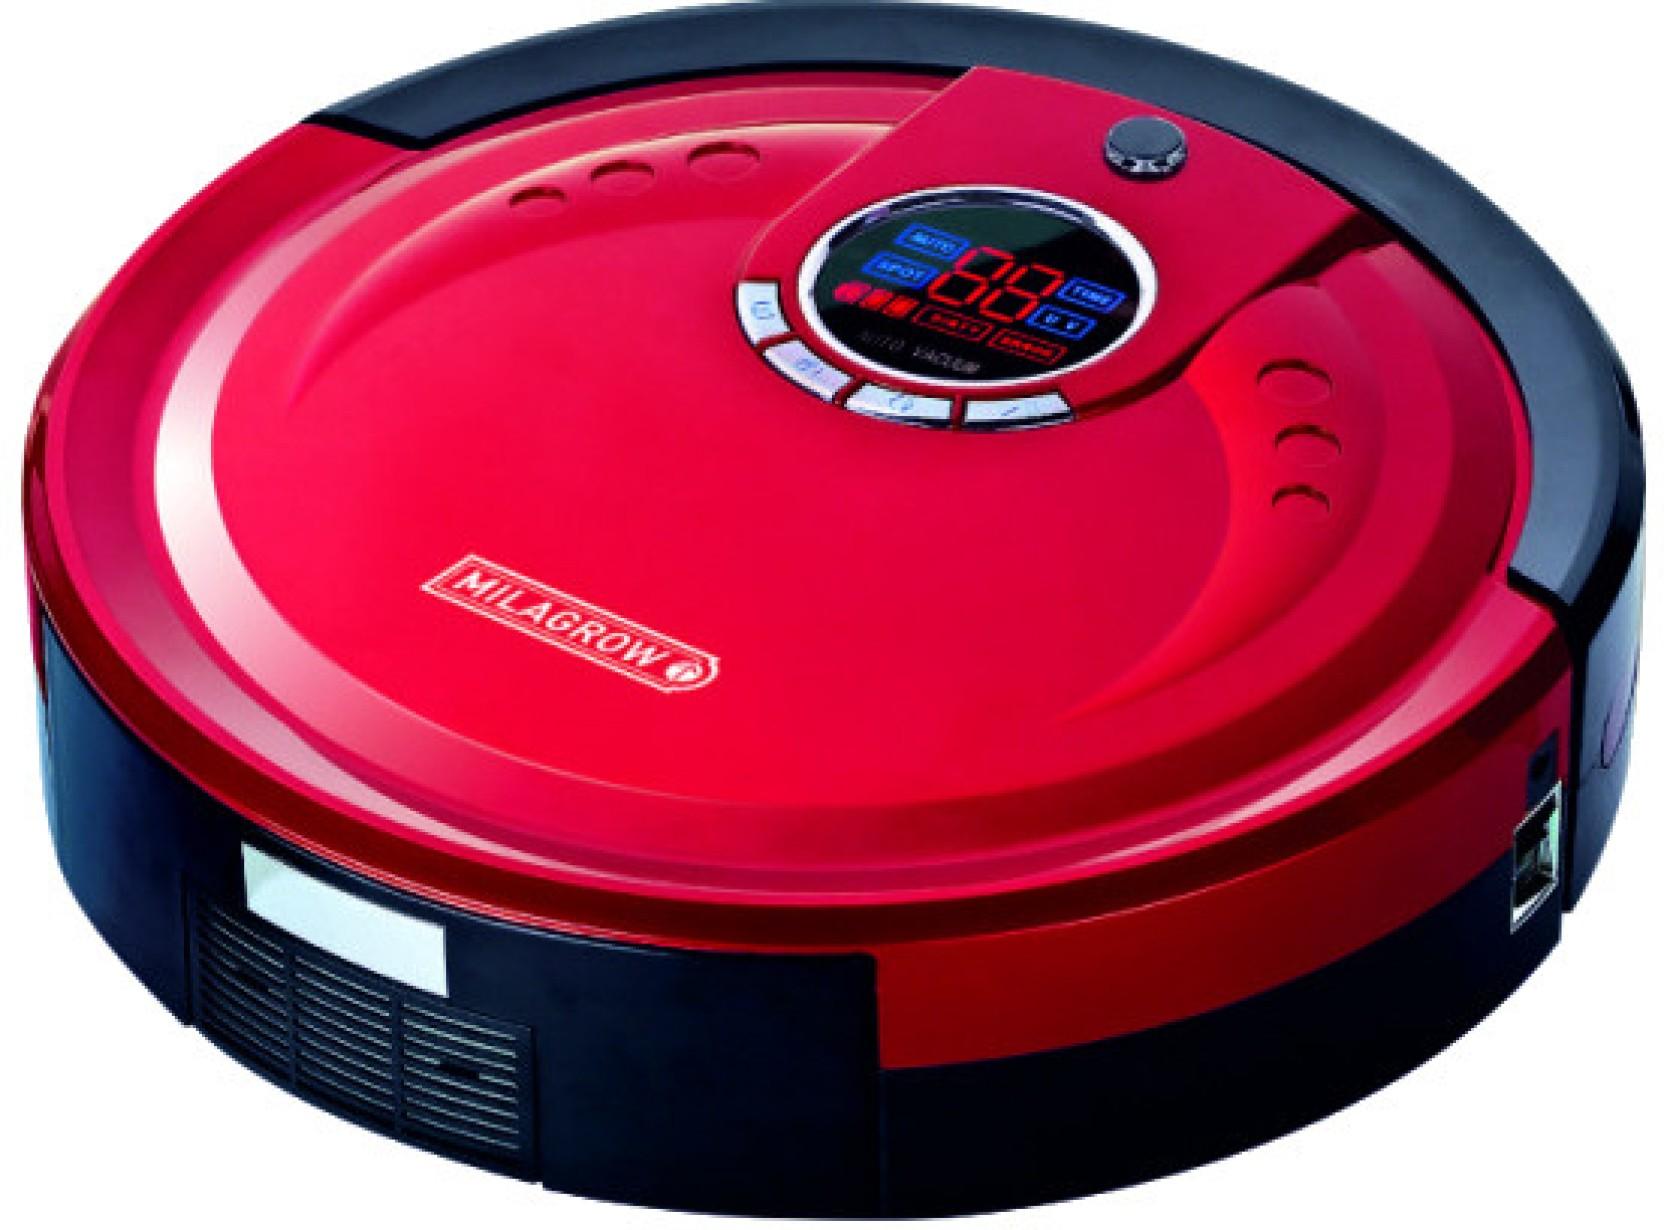 milagrow redhawk robotic floor cleaner price in india. Black Bedroom Furniture Sets. Home Design Ideas